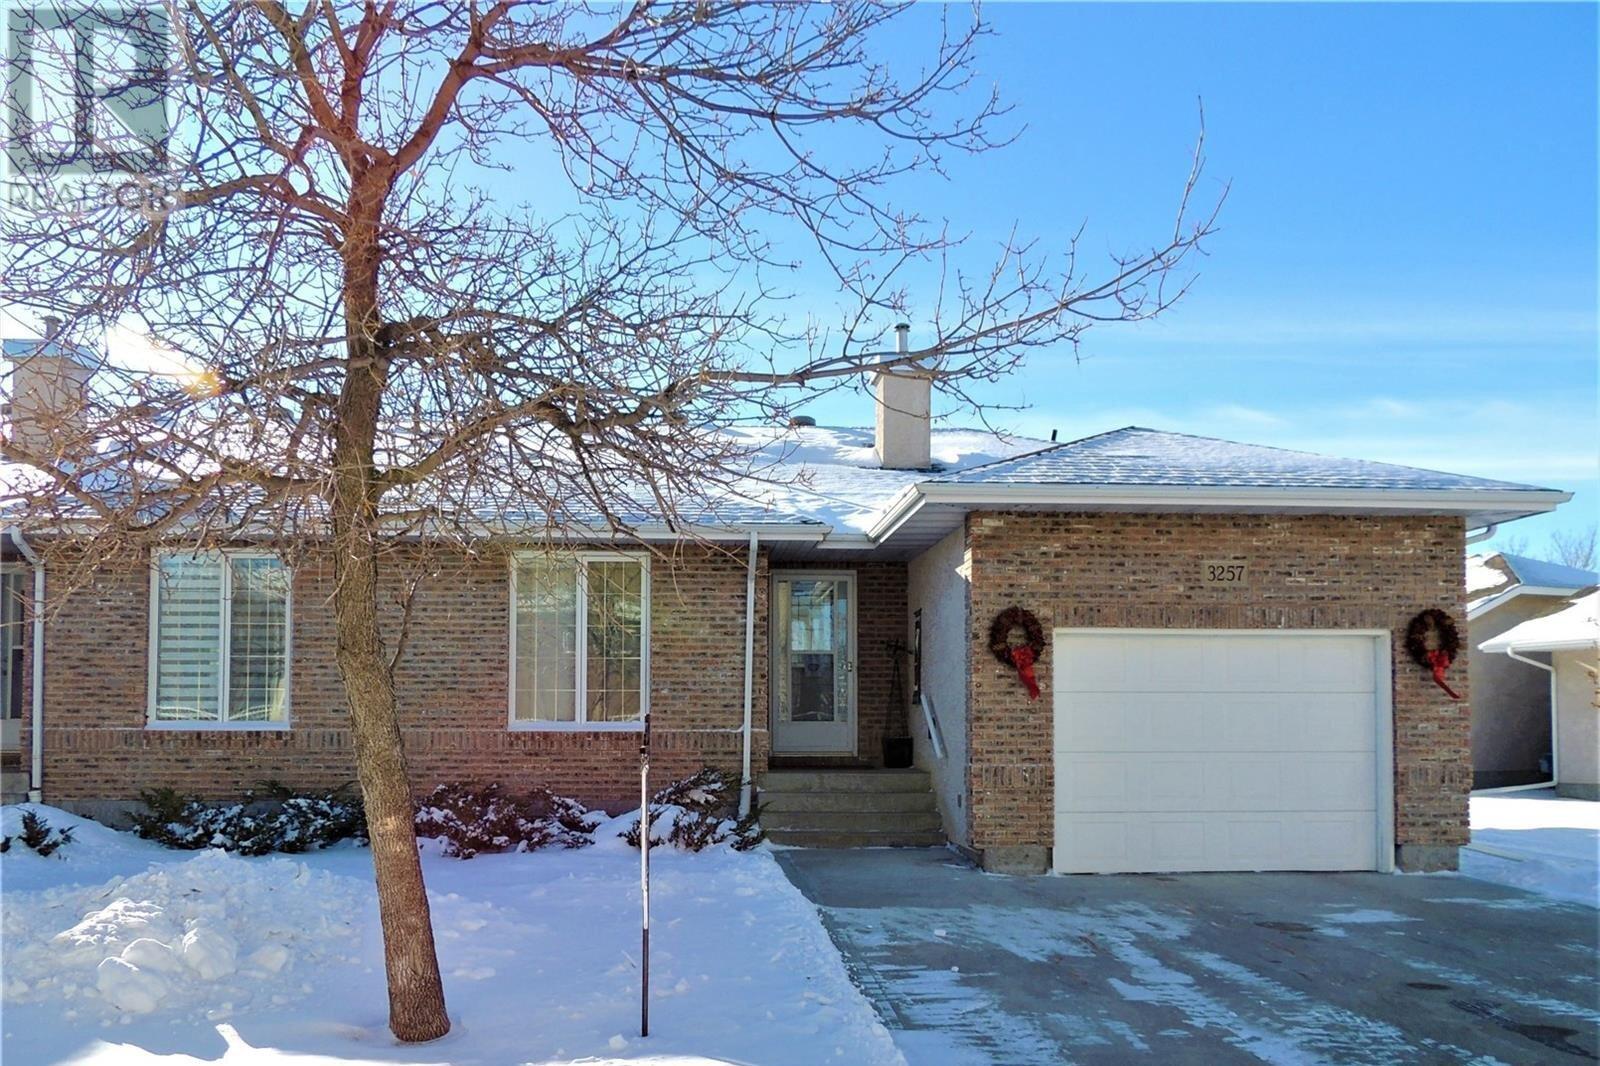 House for sale at 3257 Renfrew Cres E Regina Saskatchewan - MLS: SK818556